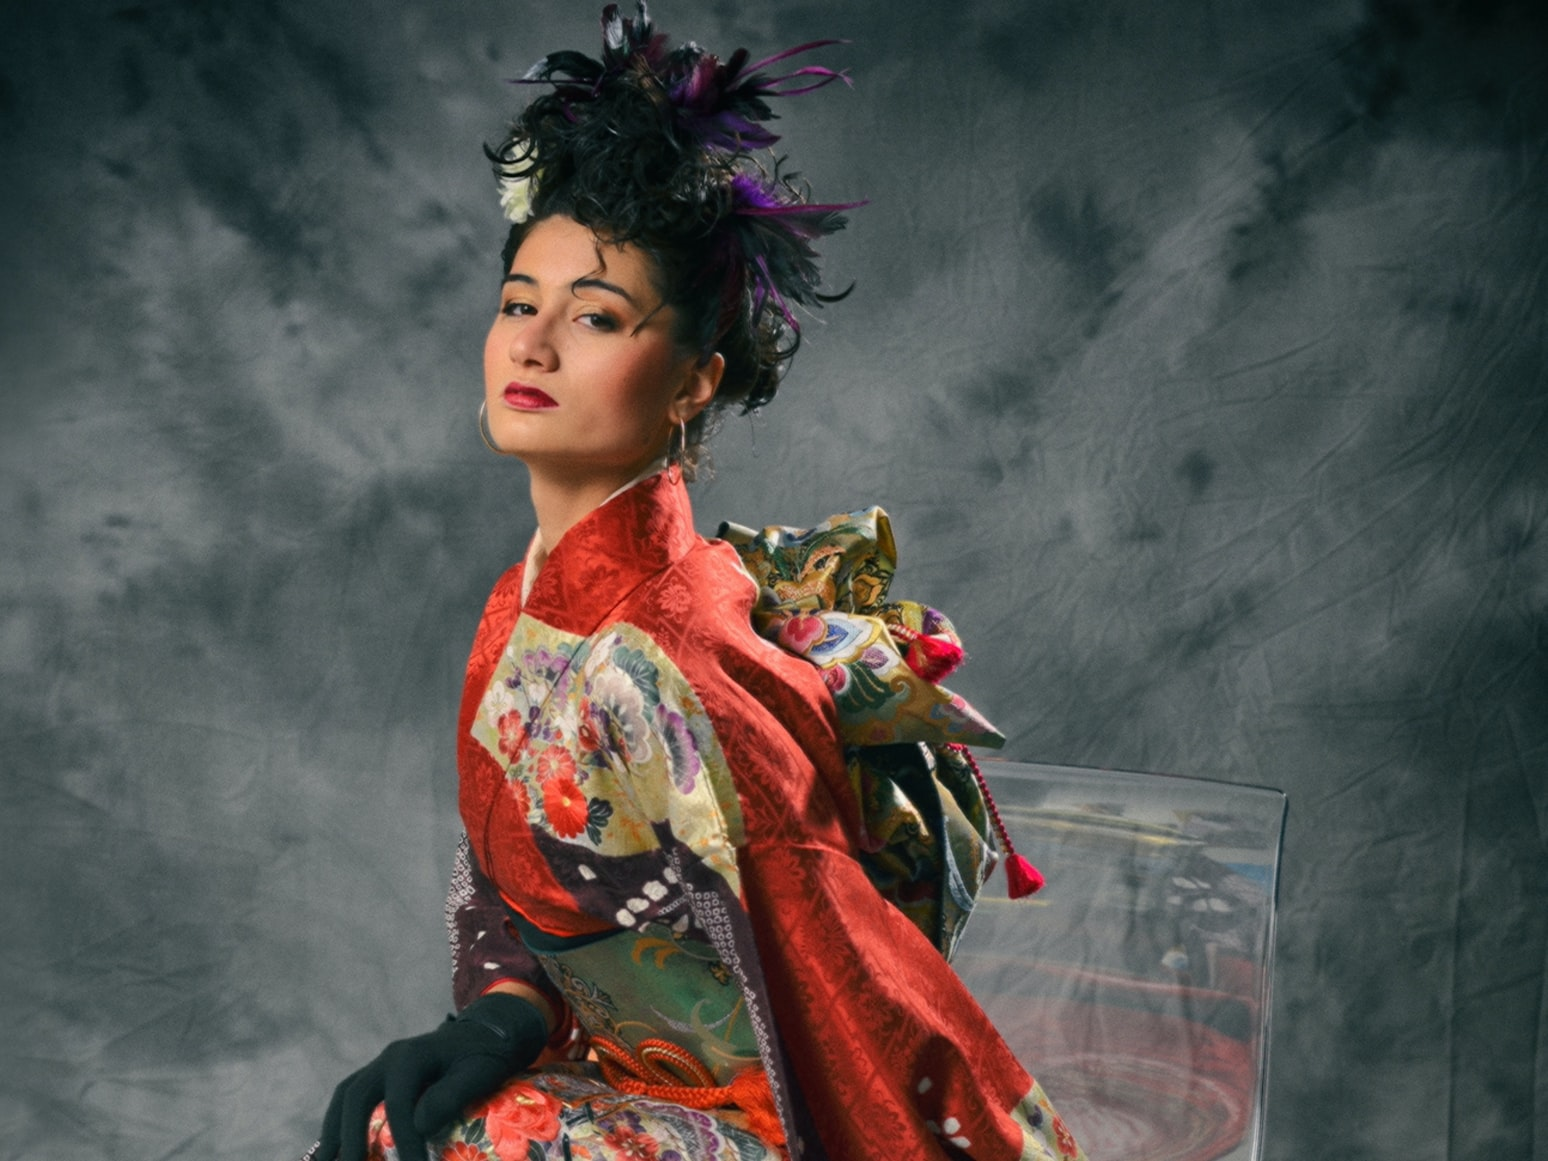 Japanese luxury fashion accessories